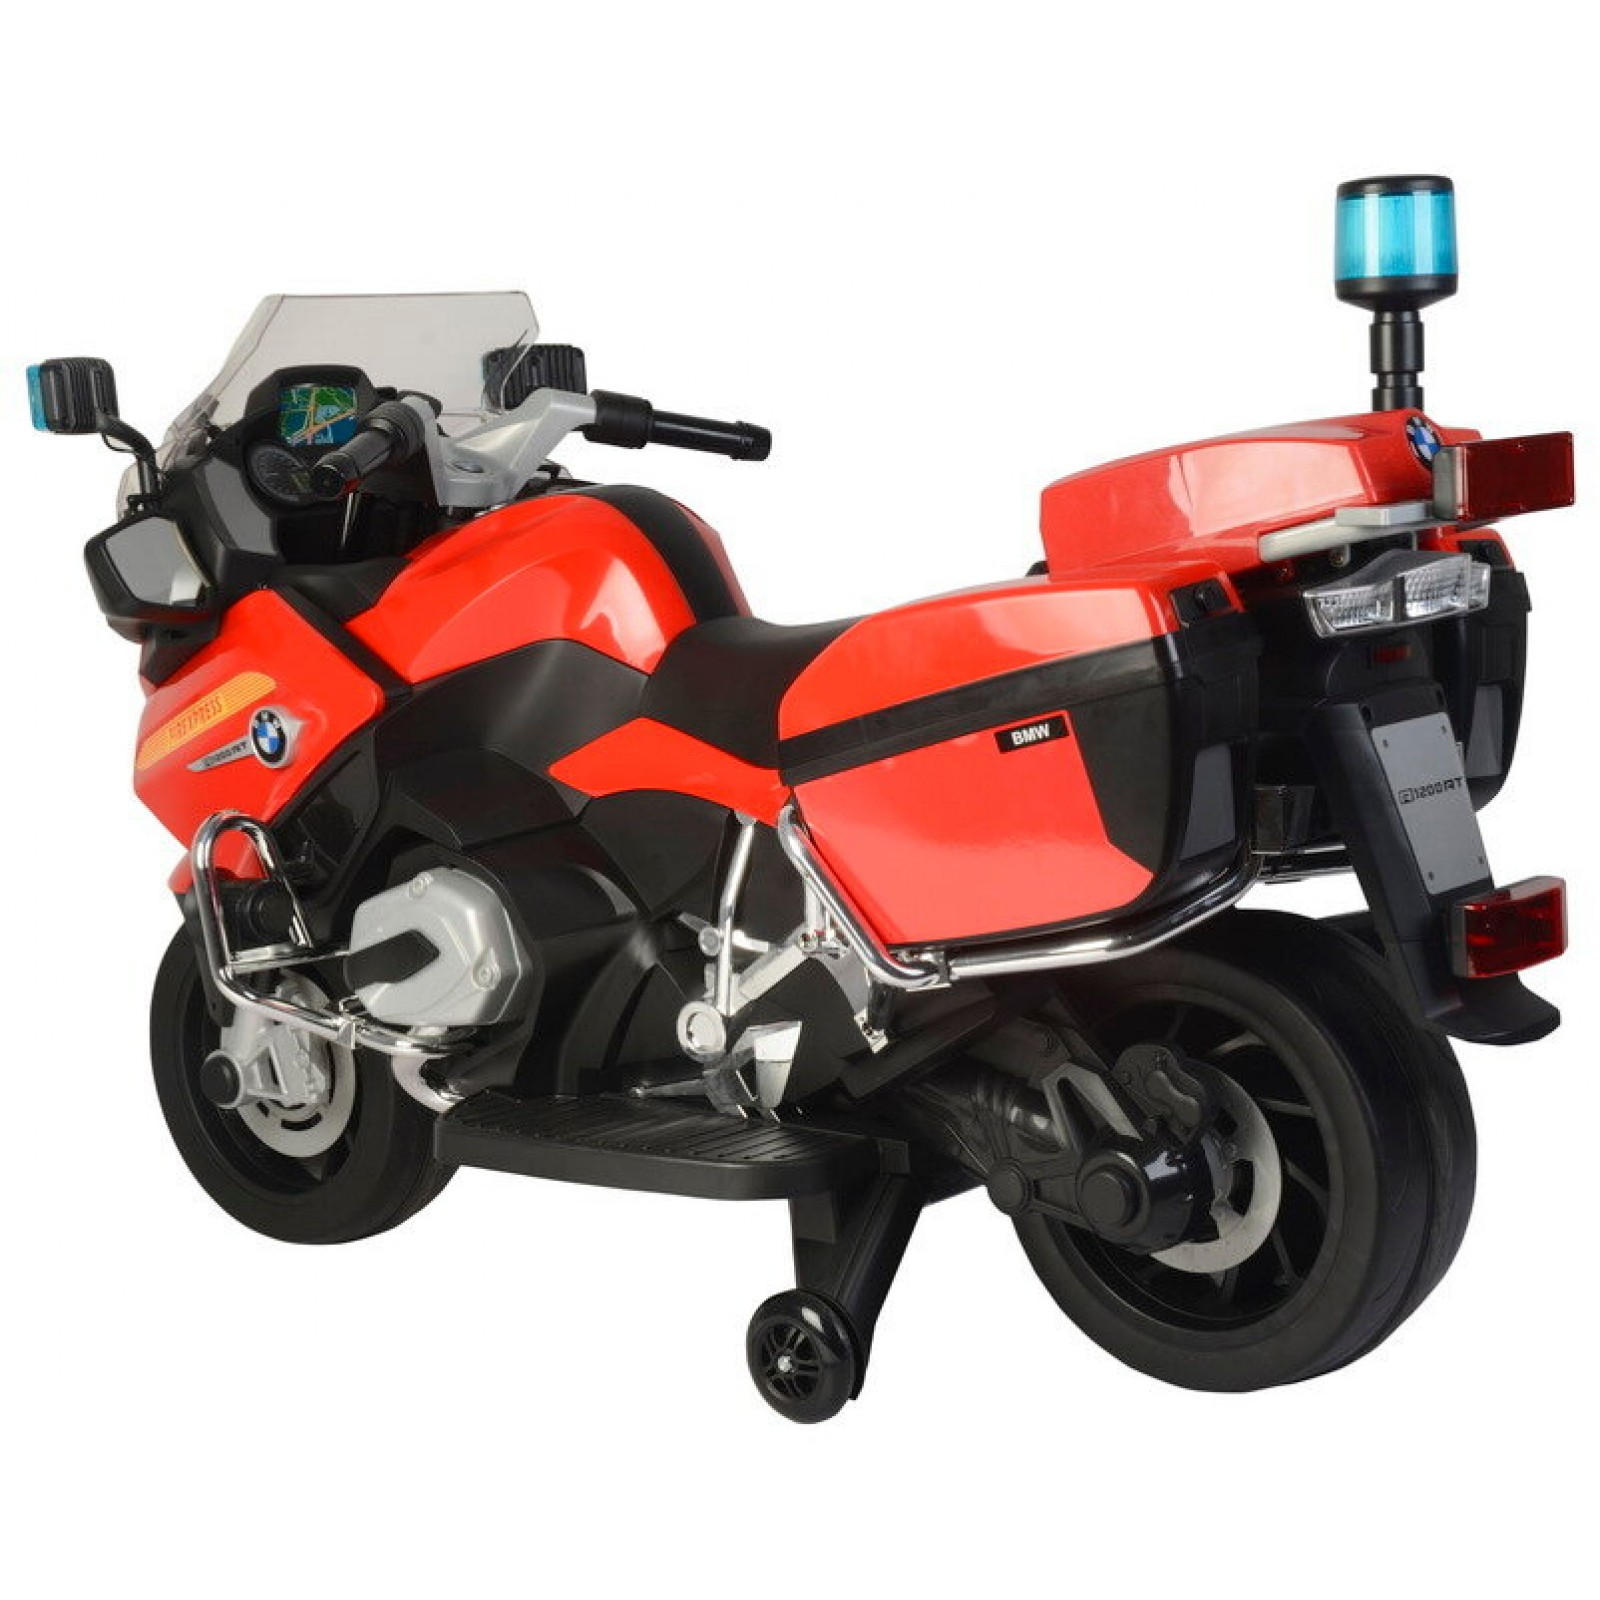 Электроквадроцикл BARTYBMW R1200RT-P PoliceMotоbaike (Z212)